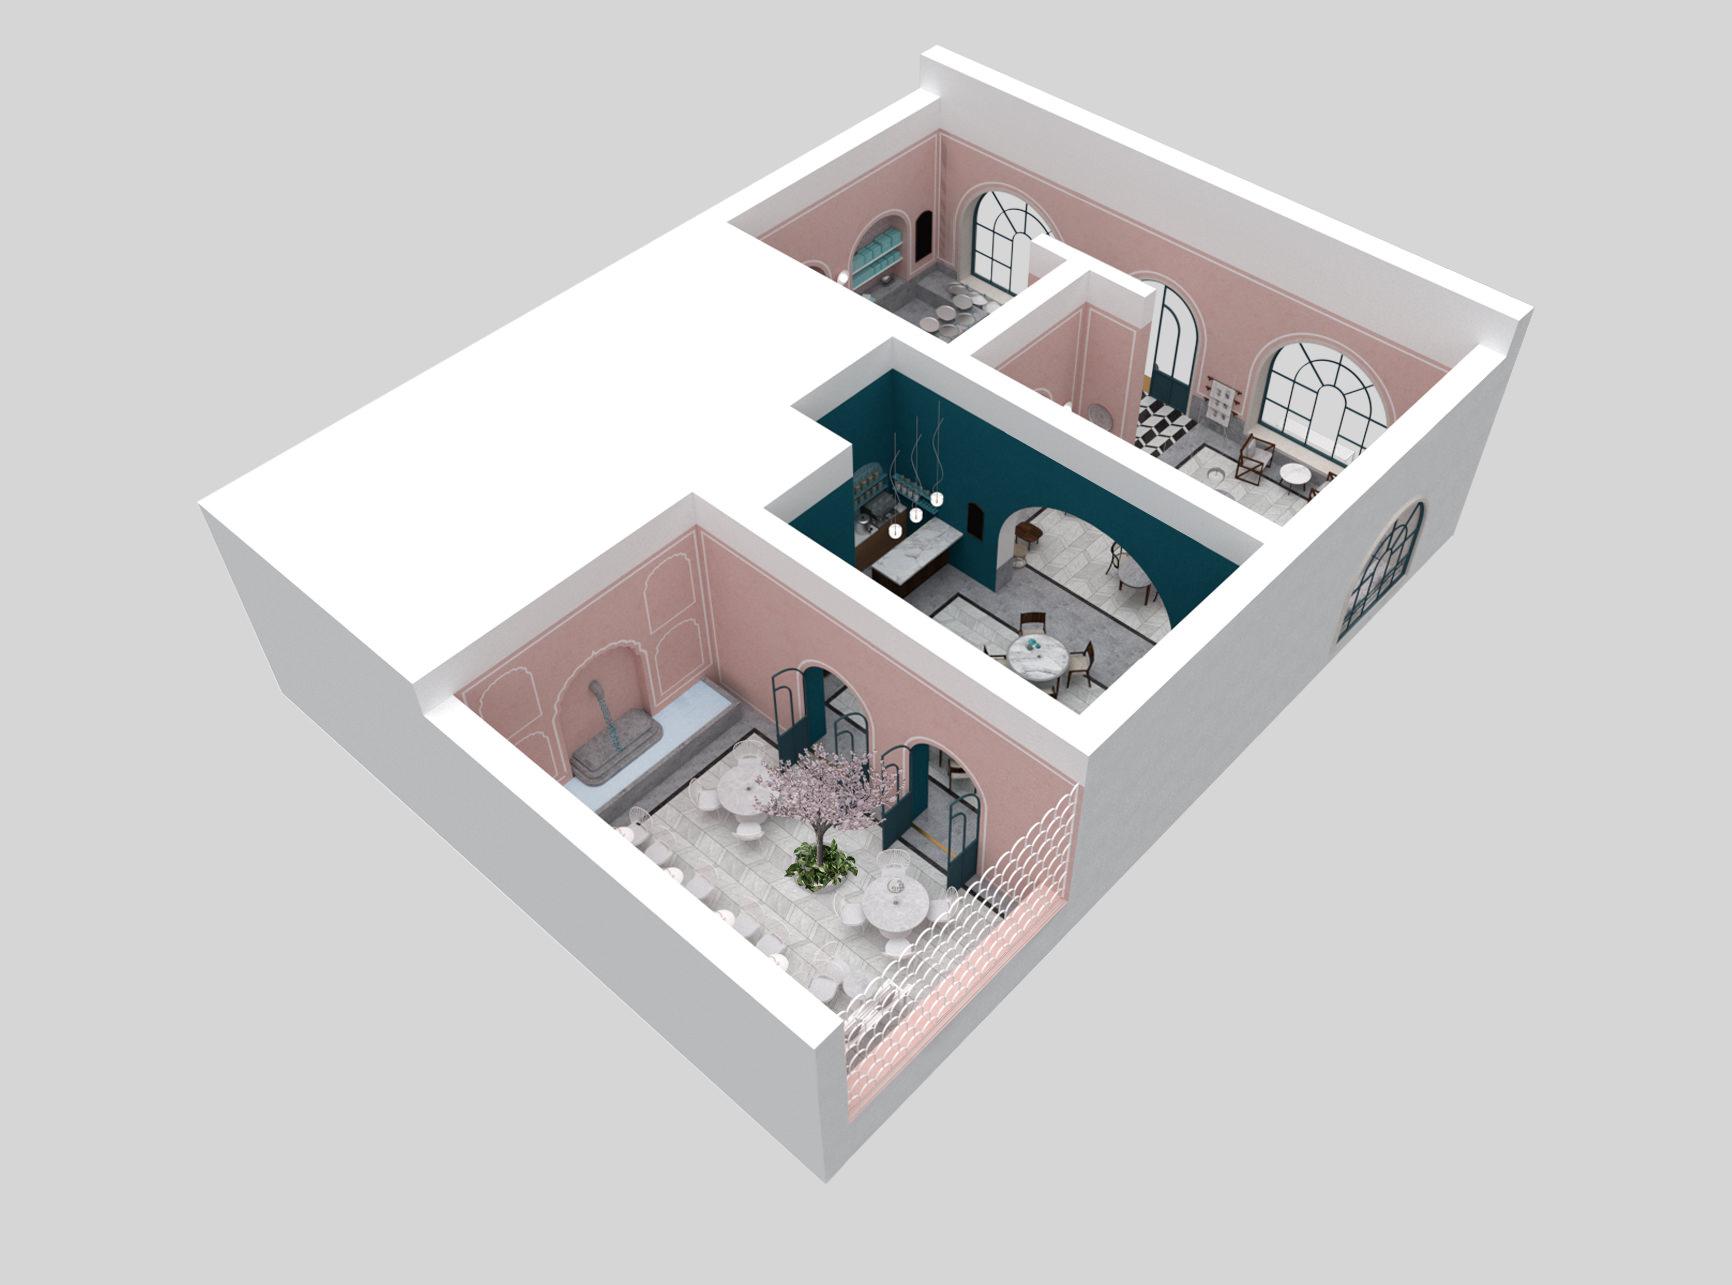 lunarlunar_interior_design_cafe_bakery_restaurant_pistachio_rose_AXO View 1.jpg